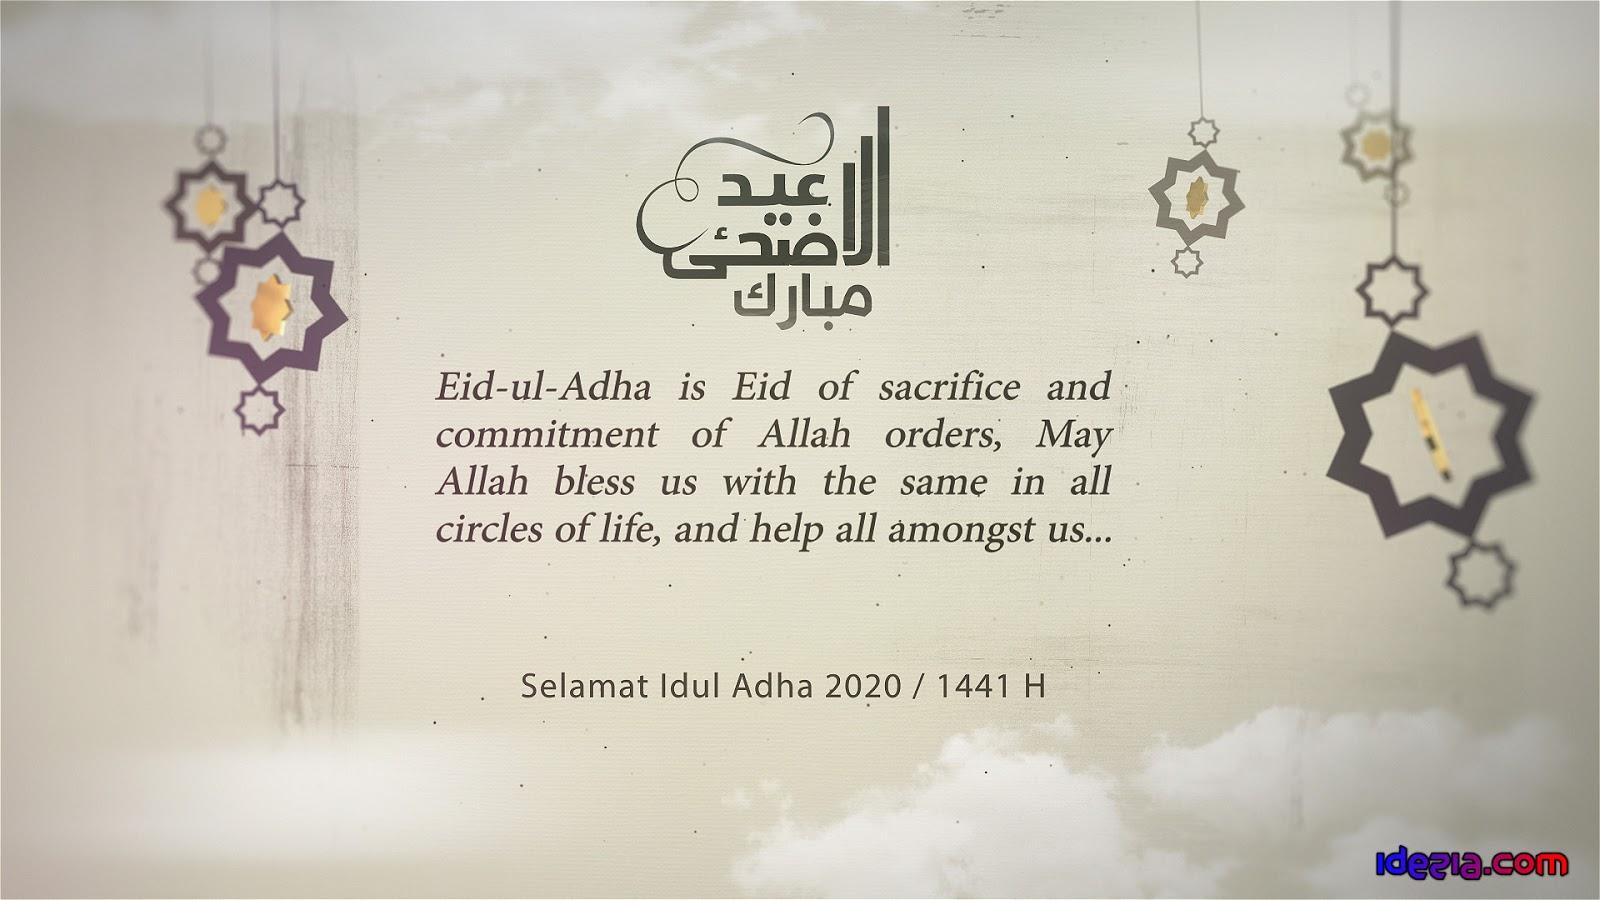 Gambar Ucapan Selamat Idul Adha 2020 - 1441 H